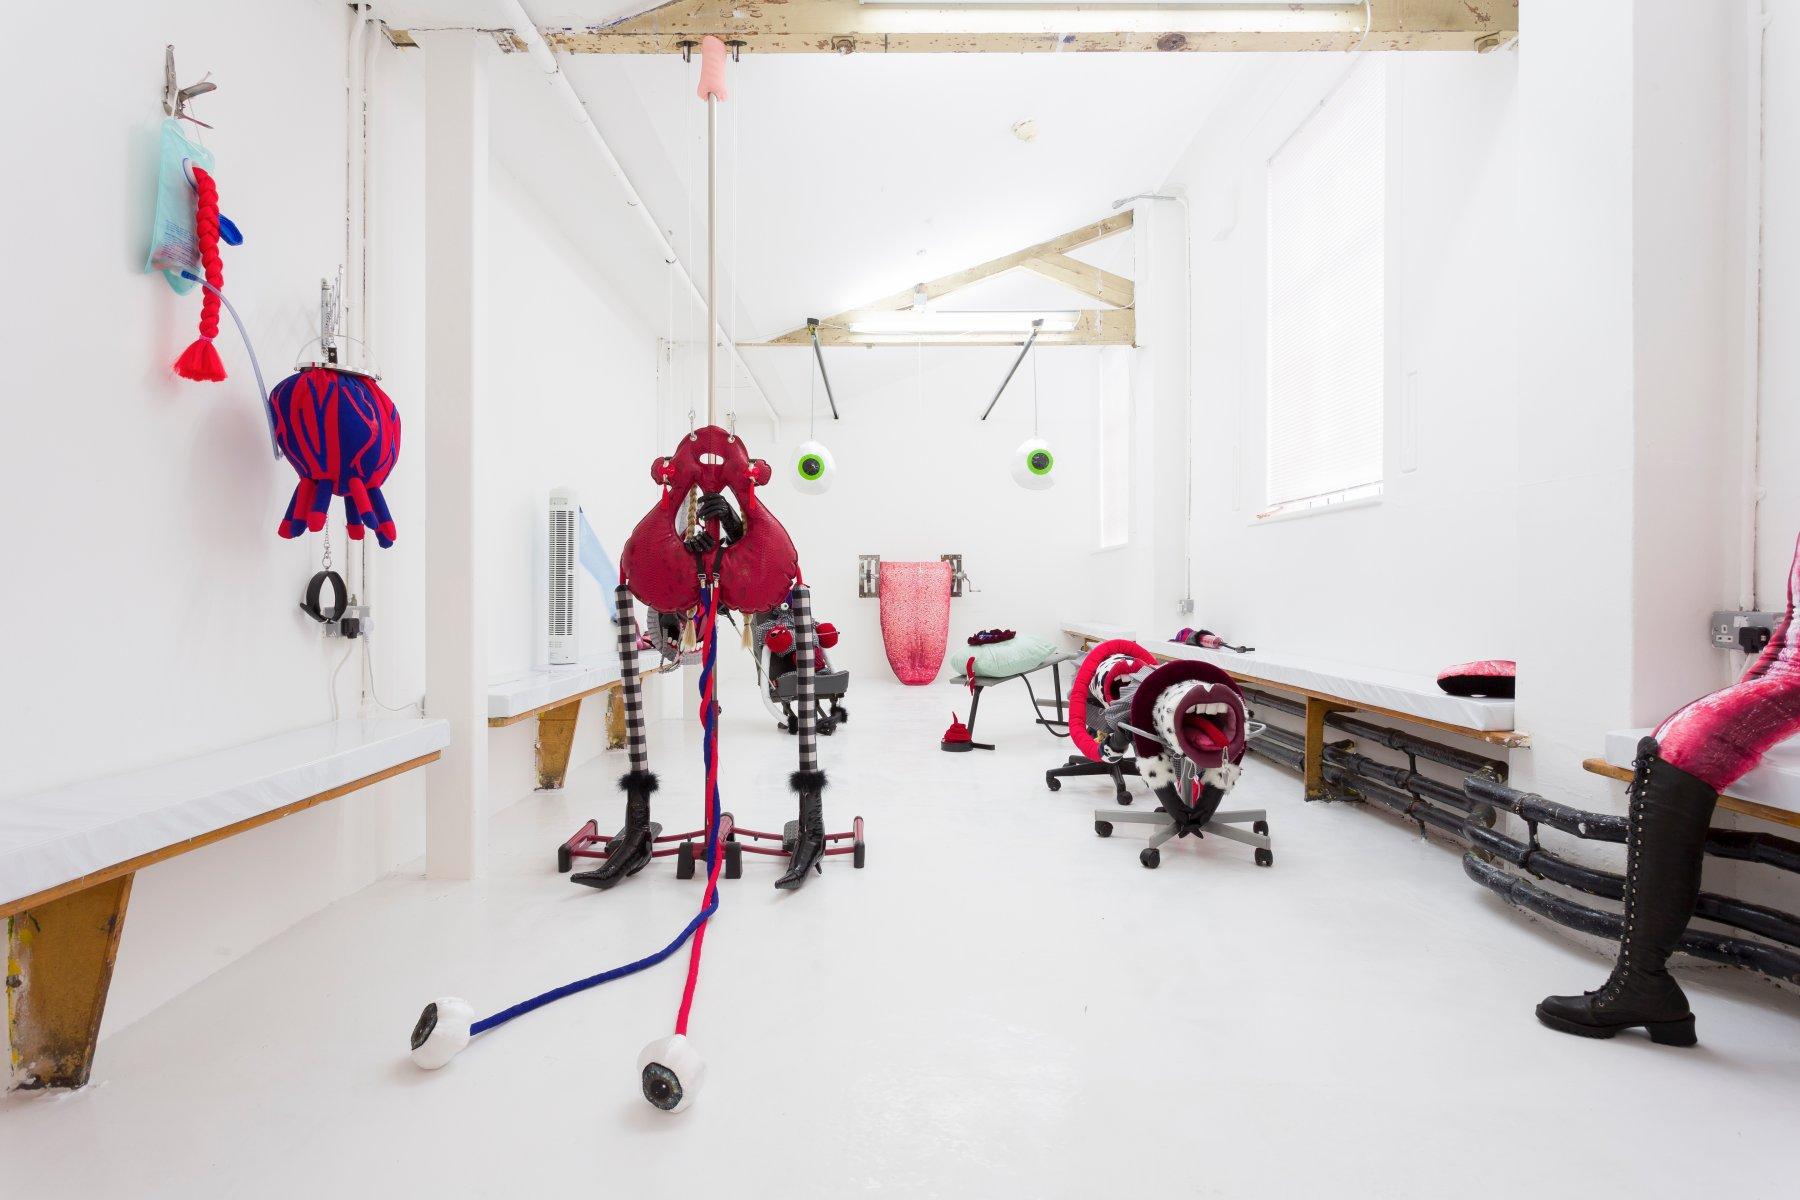 Installation views of Zabludowicz Collection Invites: Rosie Gibbens